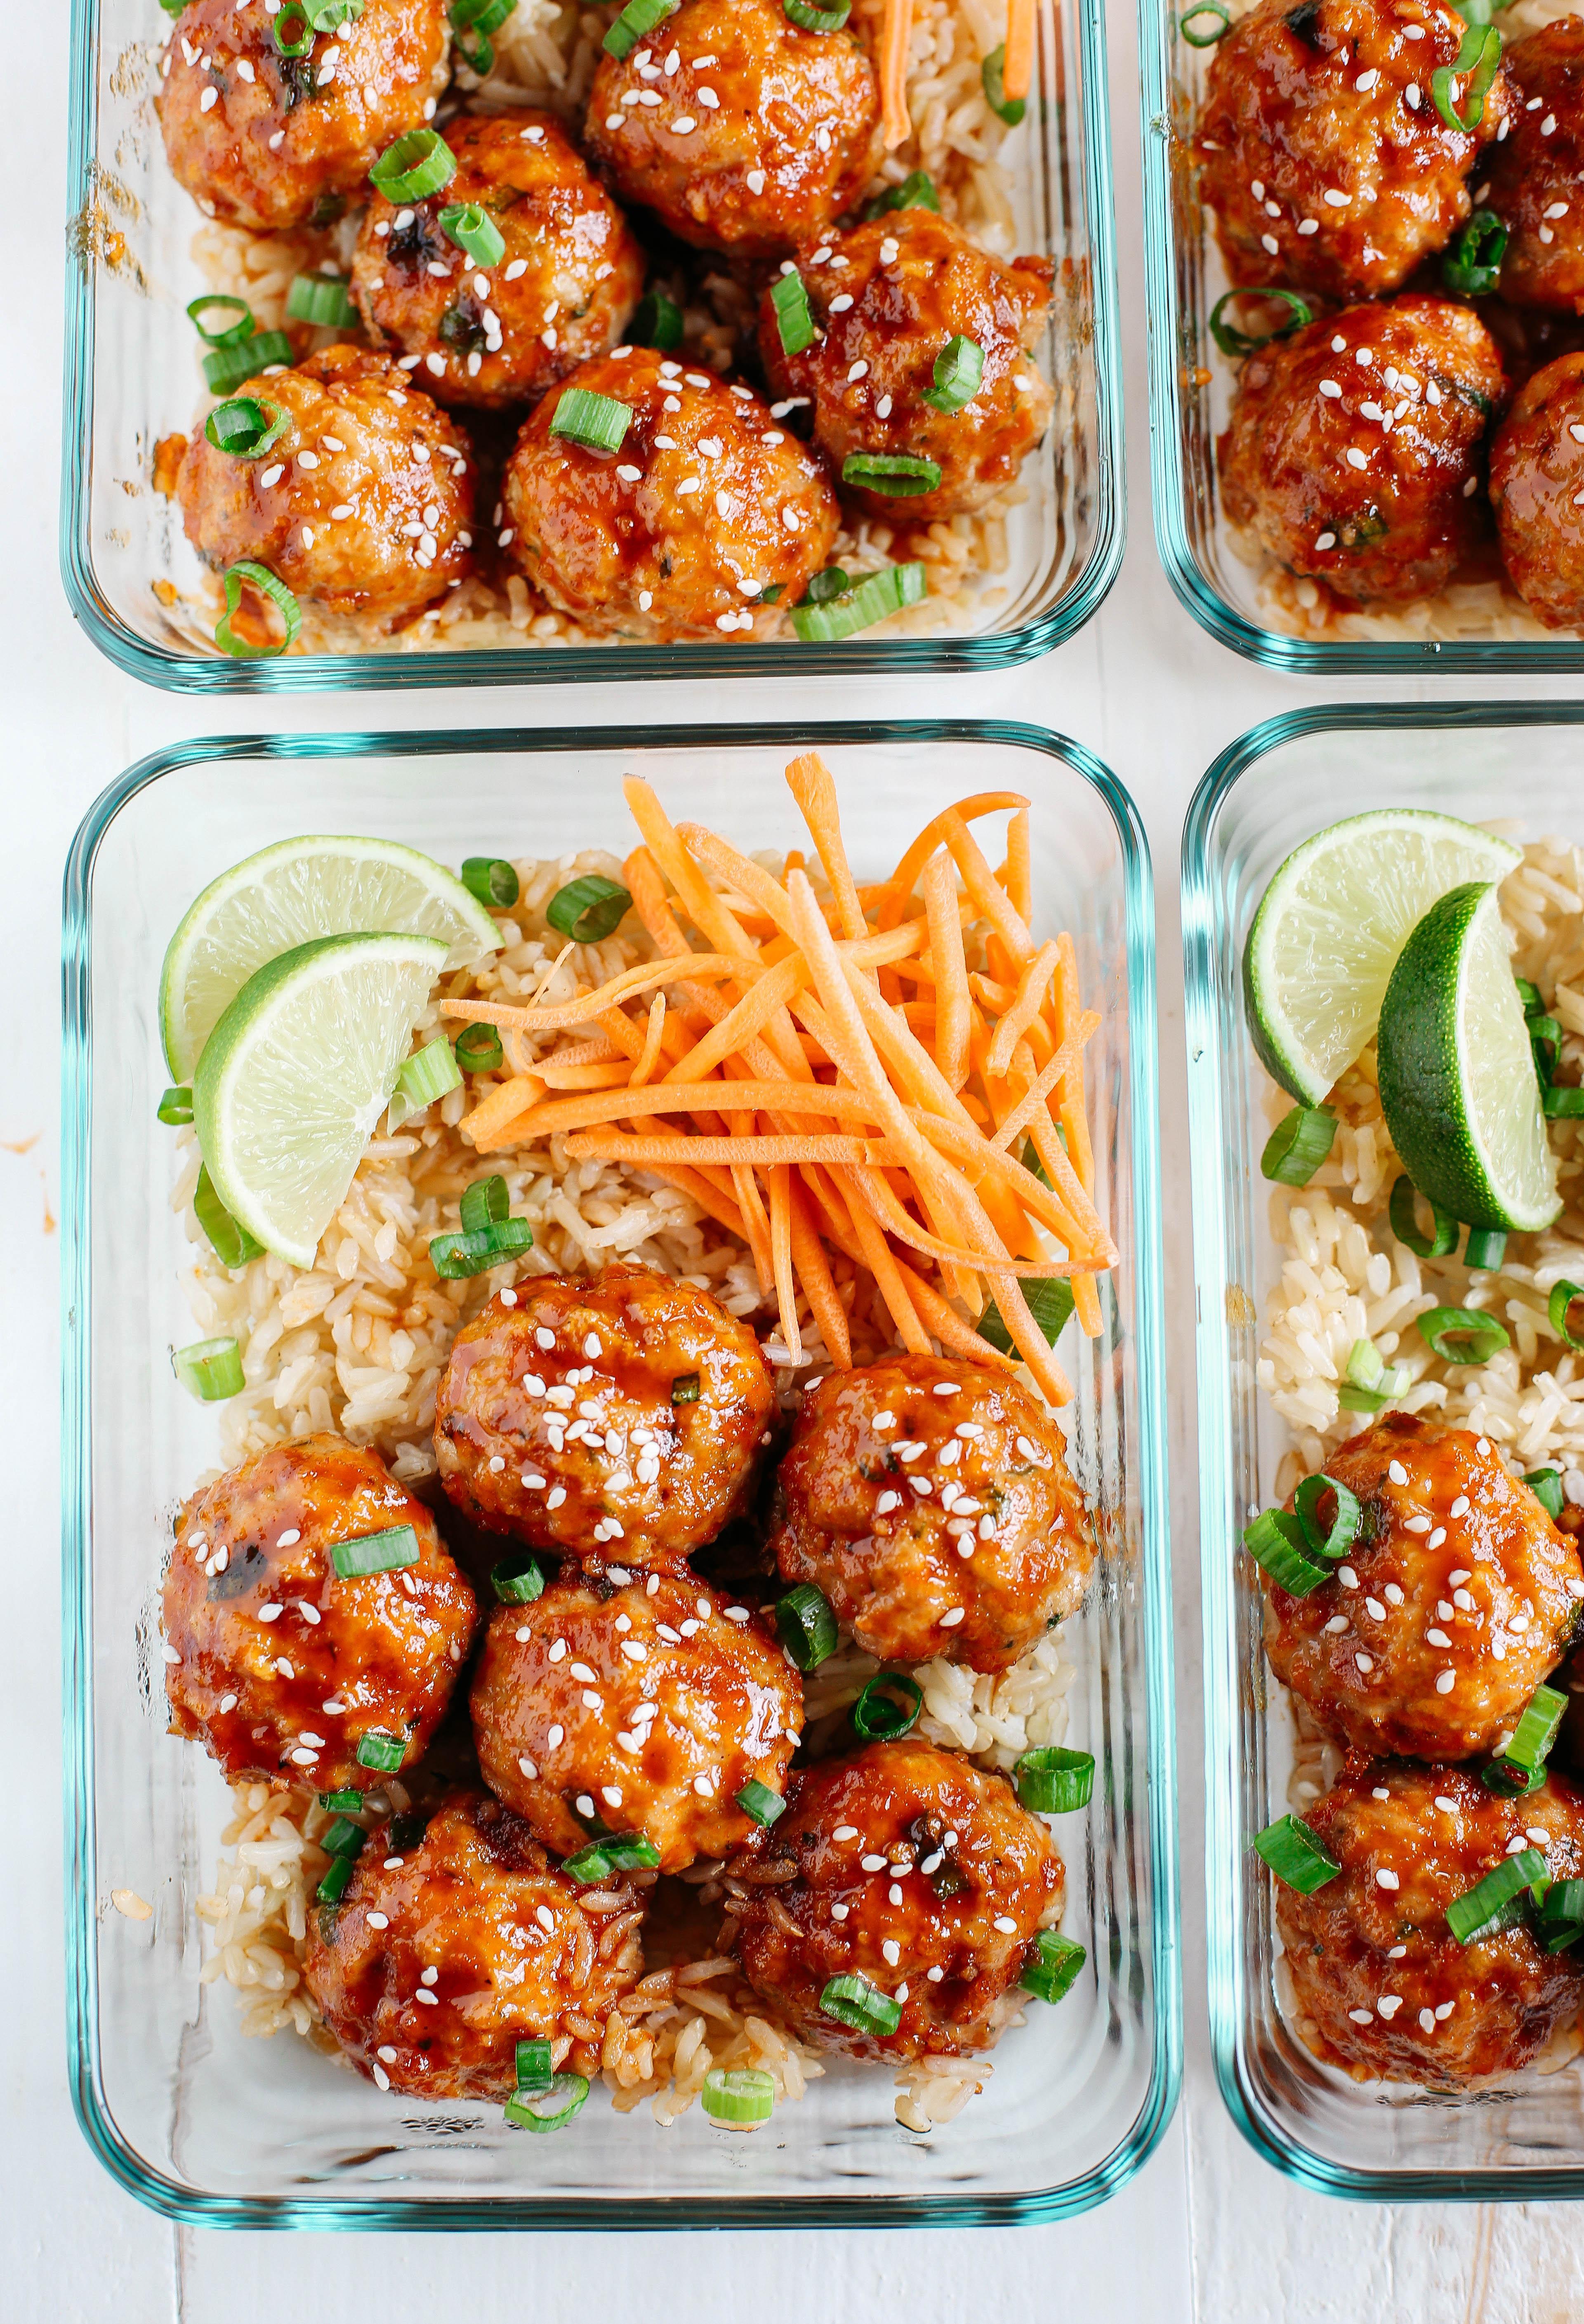 Honey Sriracha Glazed Meatballs